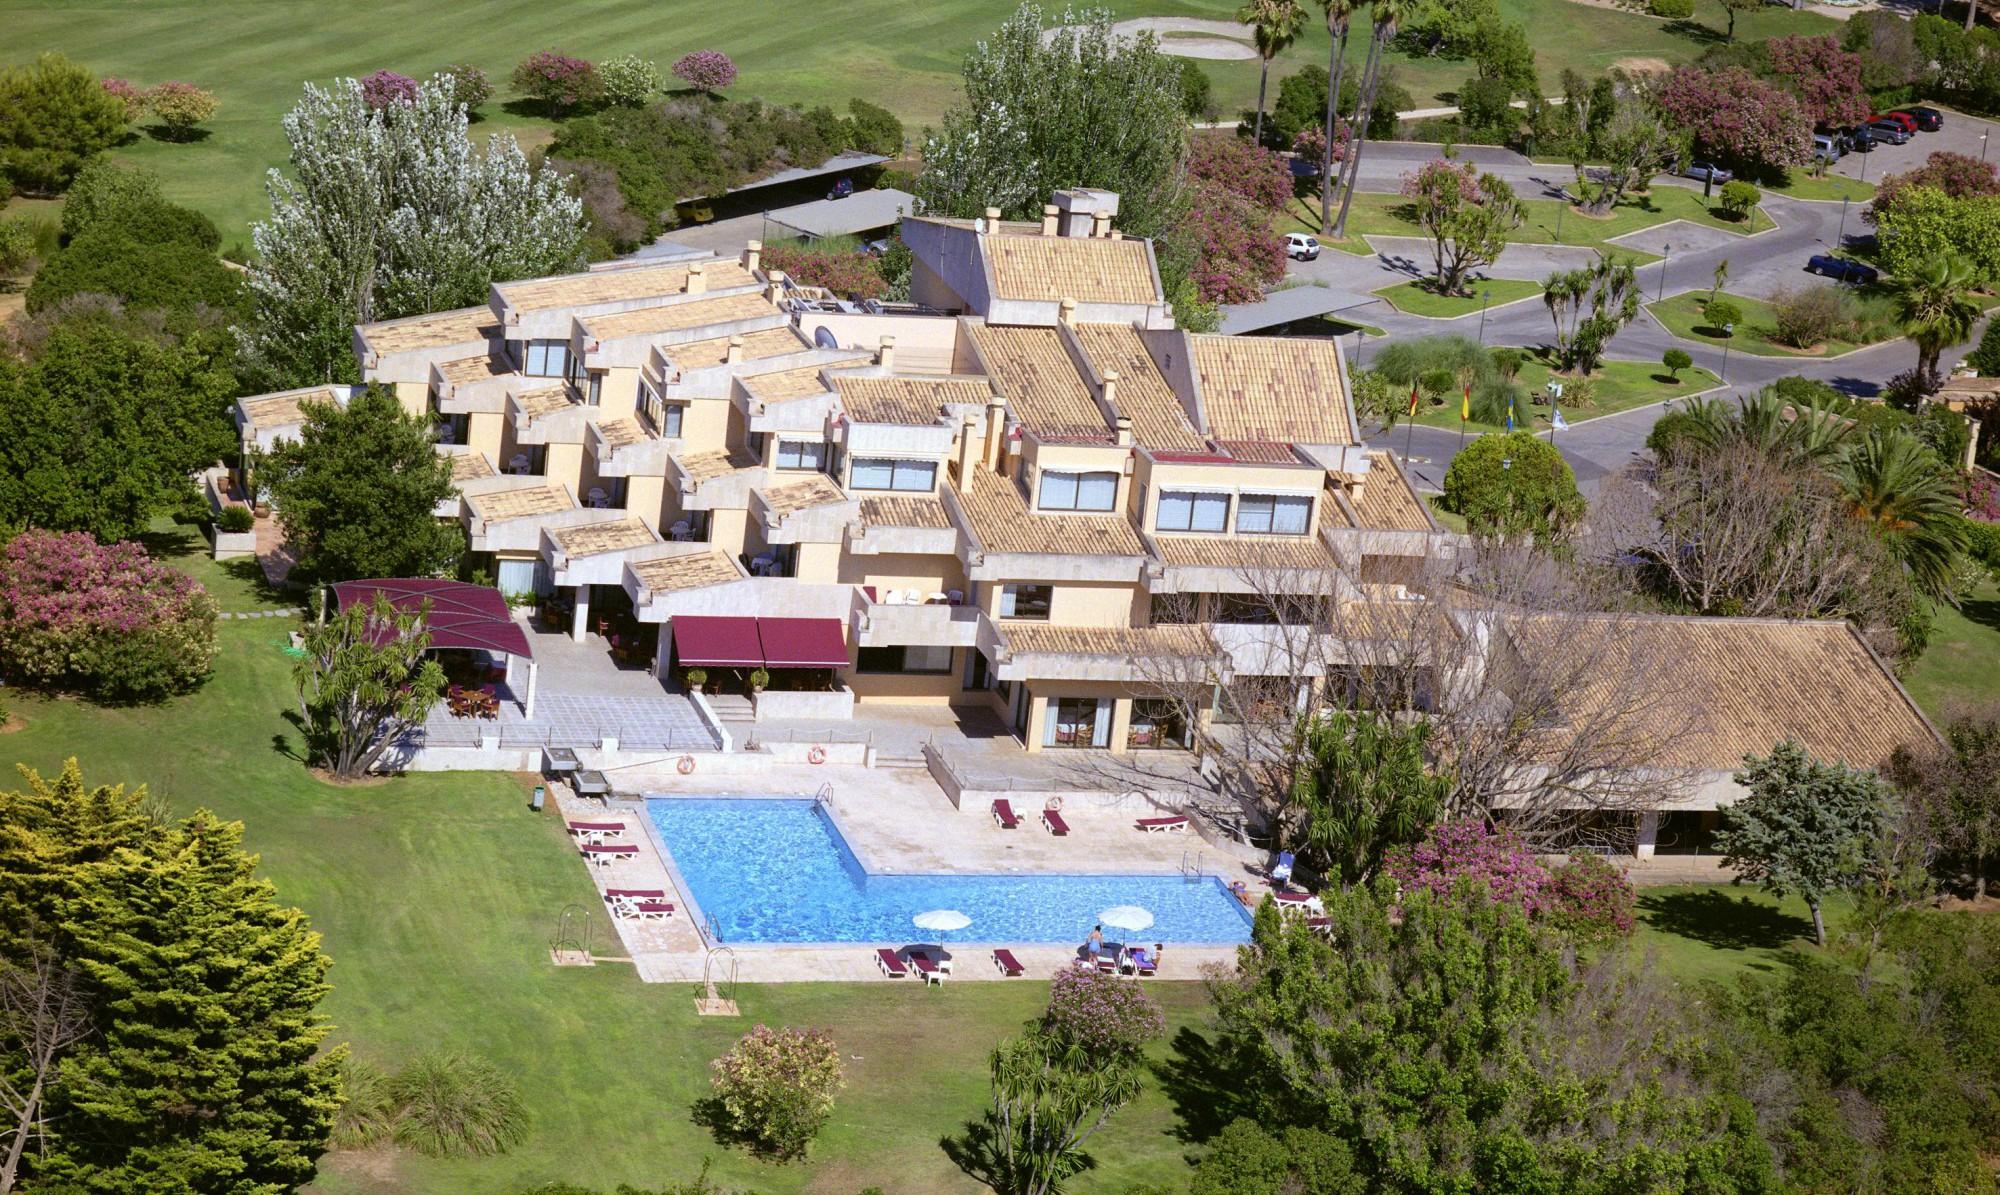 golf-hotel-santa-ponsa-aerial